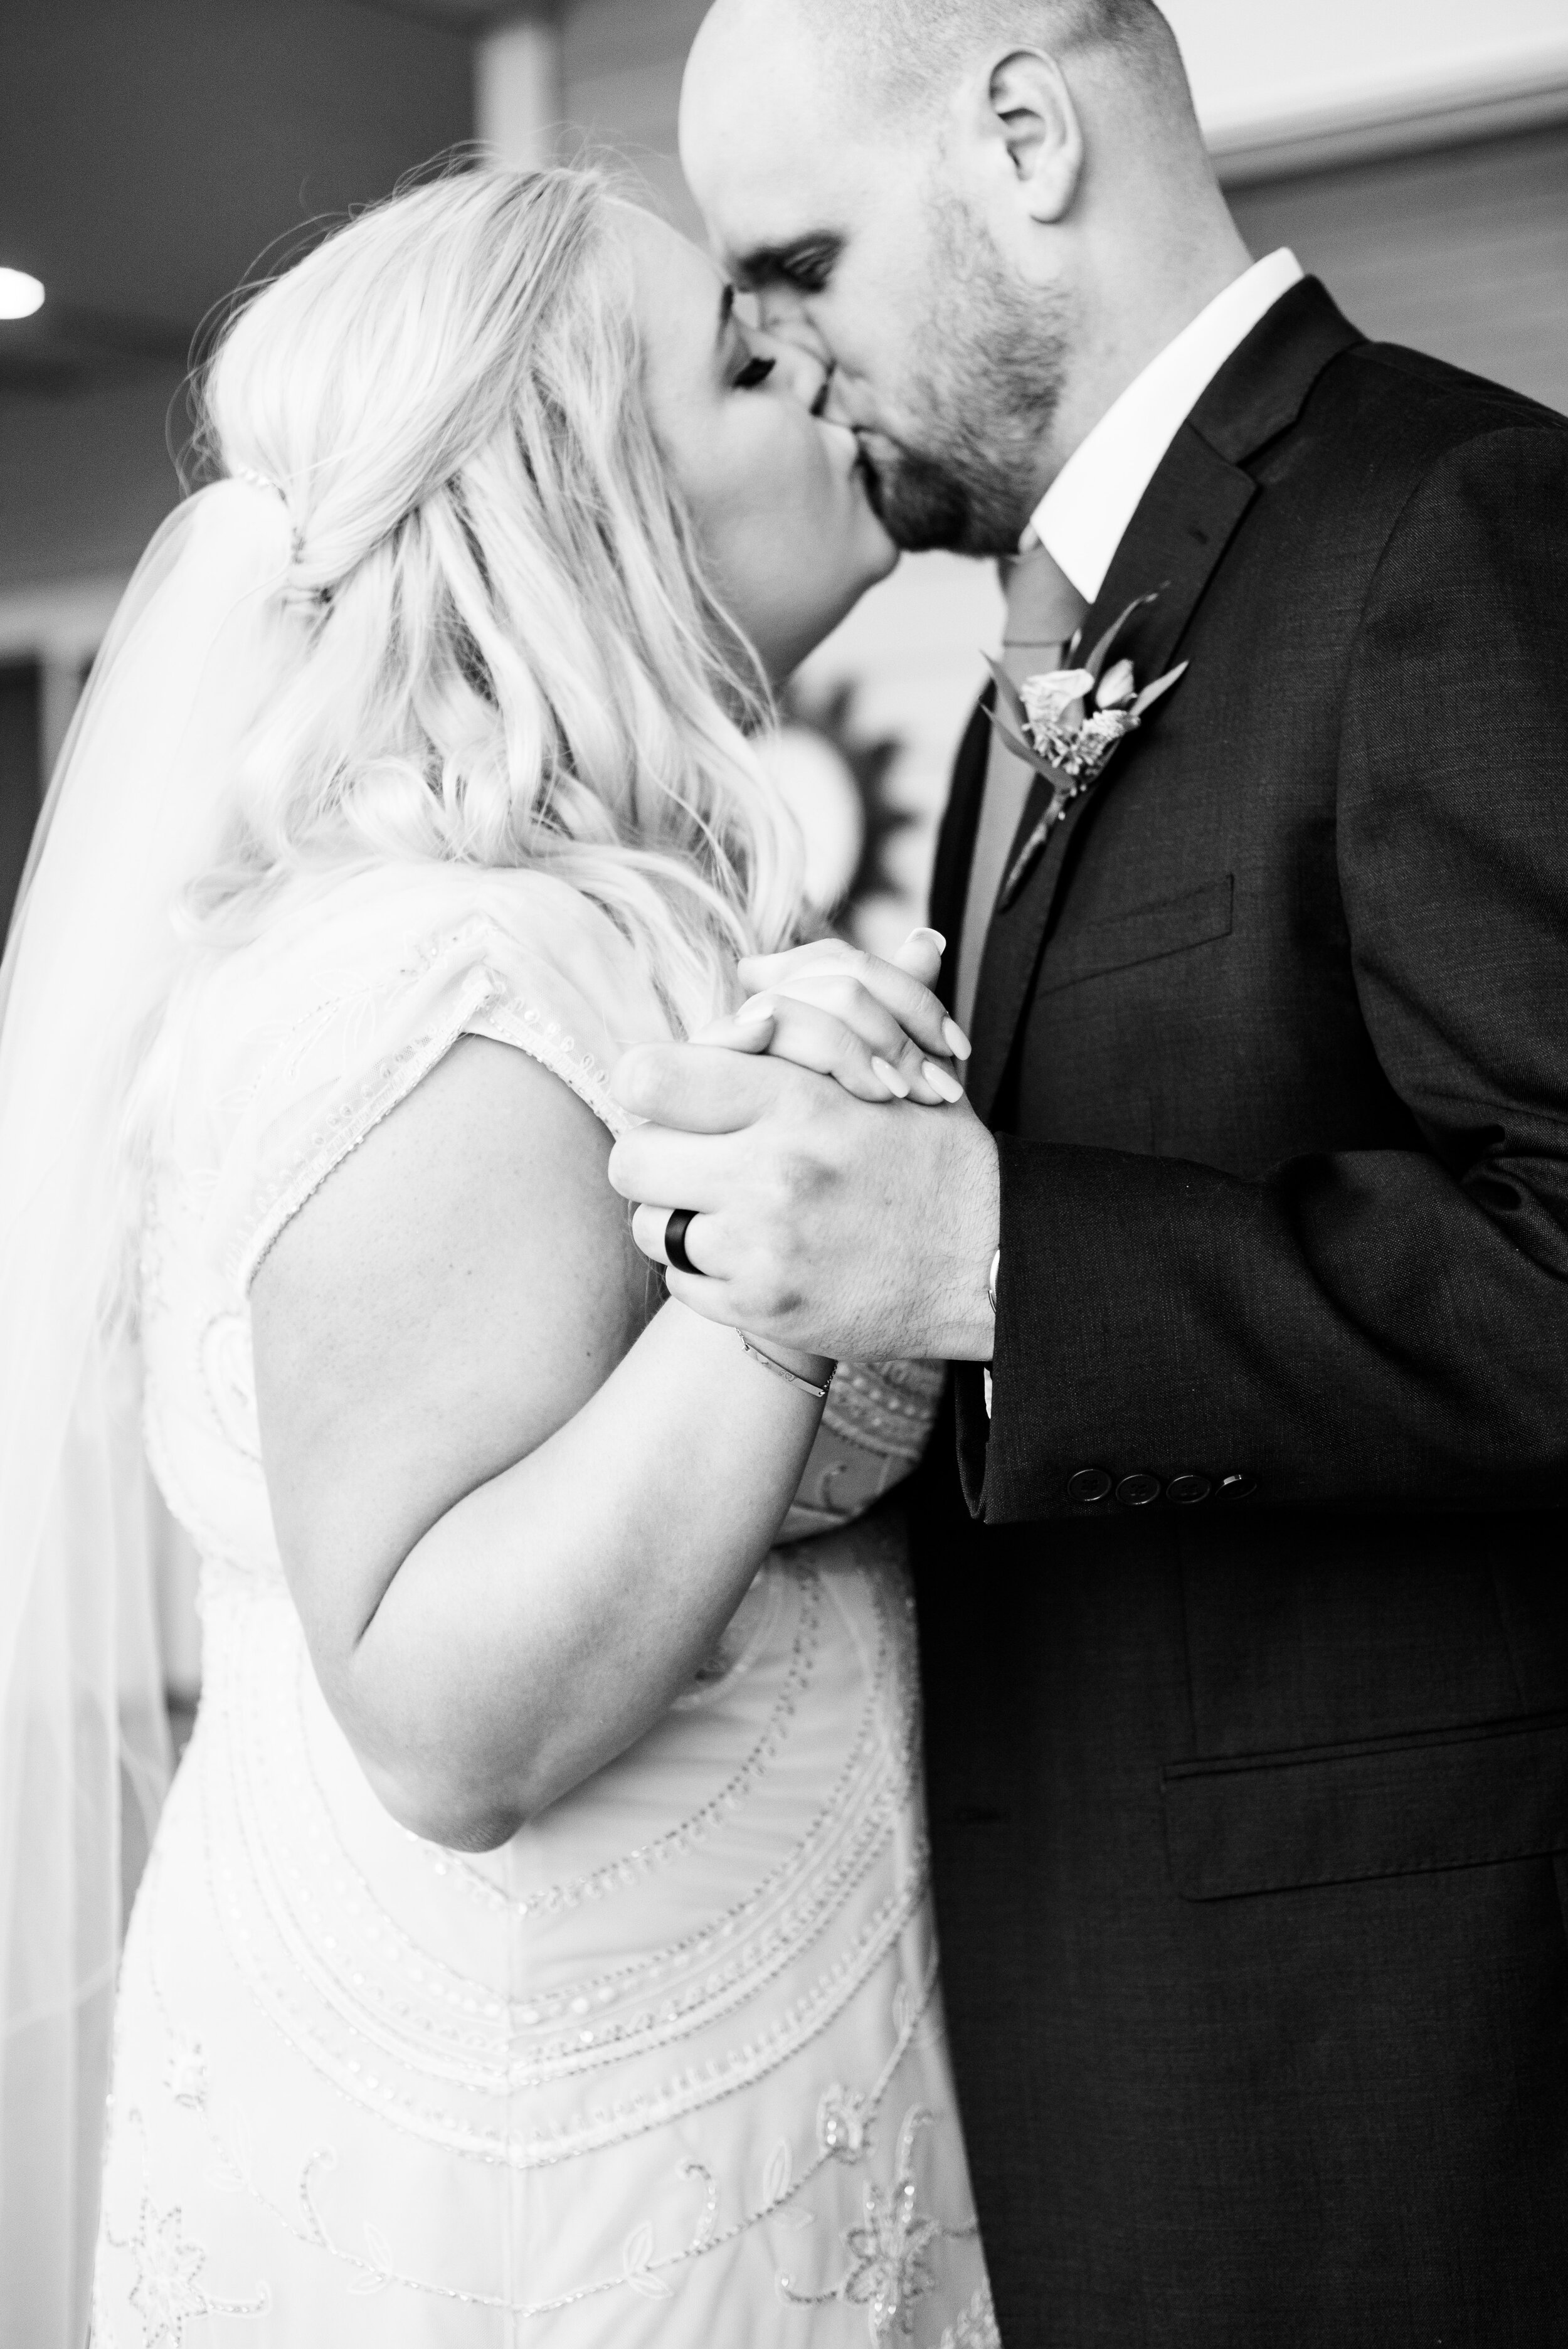 First Dance - Tri Cities Wedding Photographer - Morgan Tayler Photo & Design - Tri Cities Washington Backyard Wedding